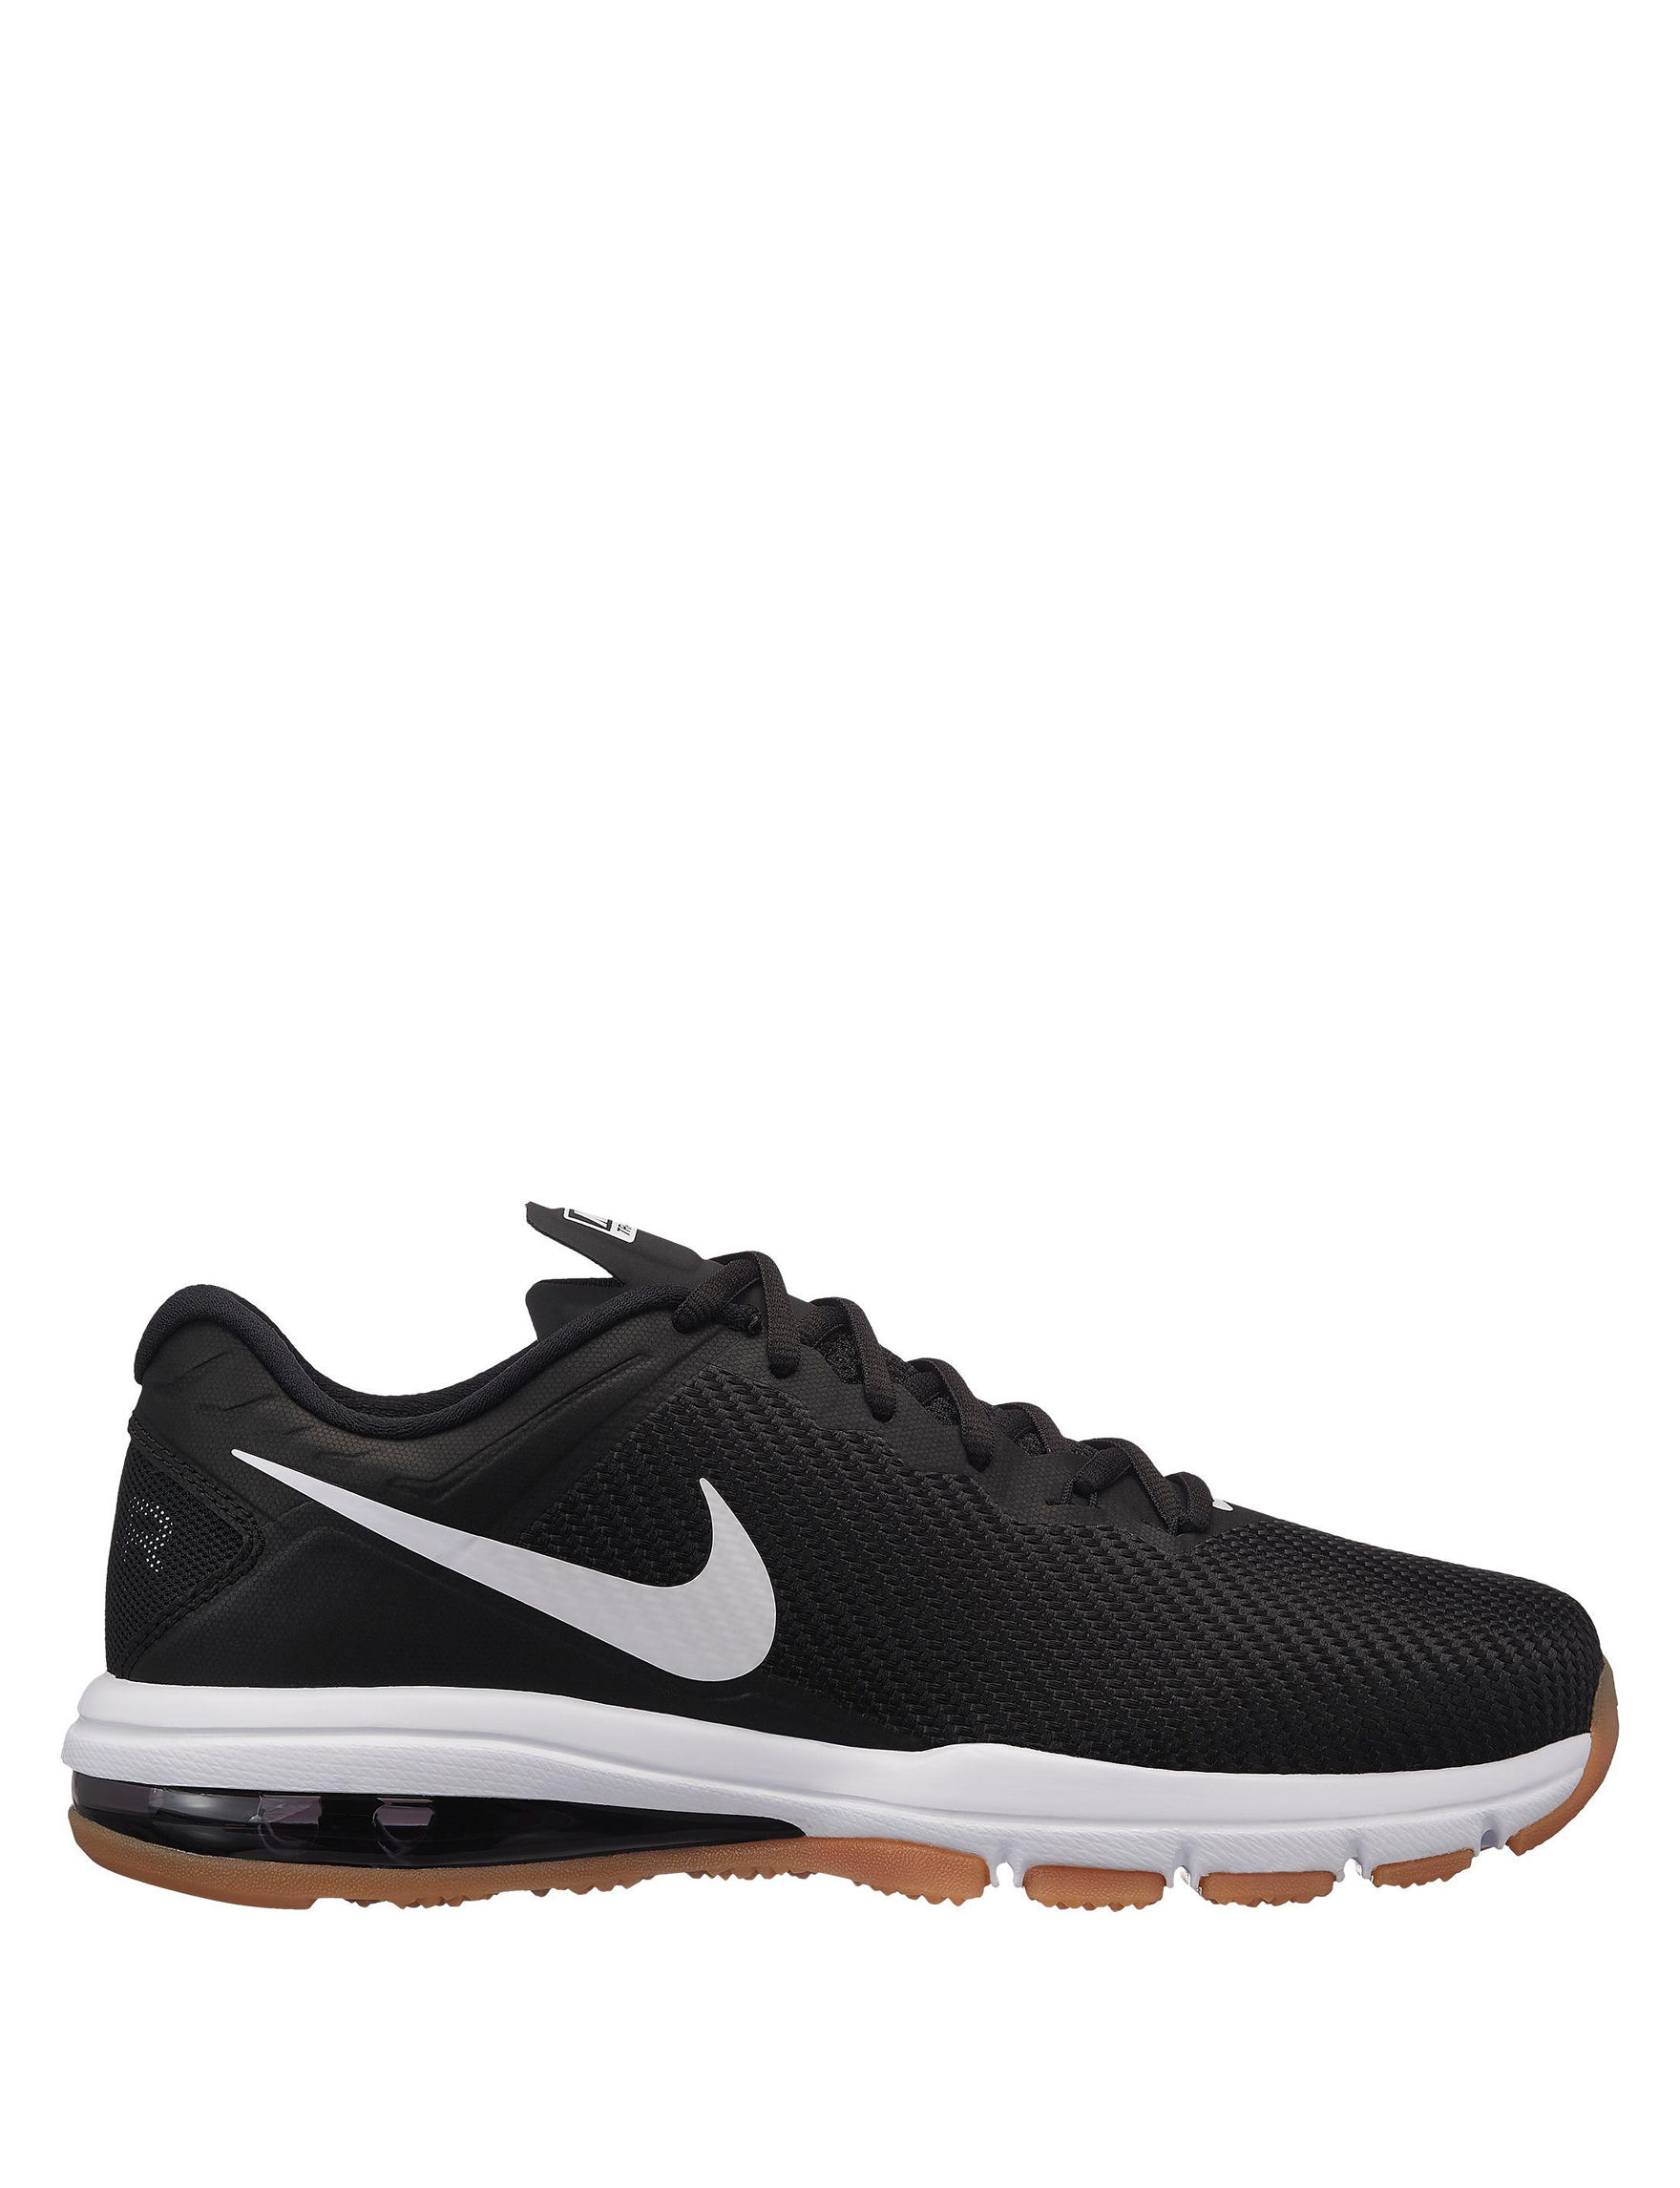 Nike Air Max 1 Ultra 2.0 SE ( BlancNoir) NoirBlanc Blanc Noir 875845 001